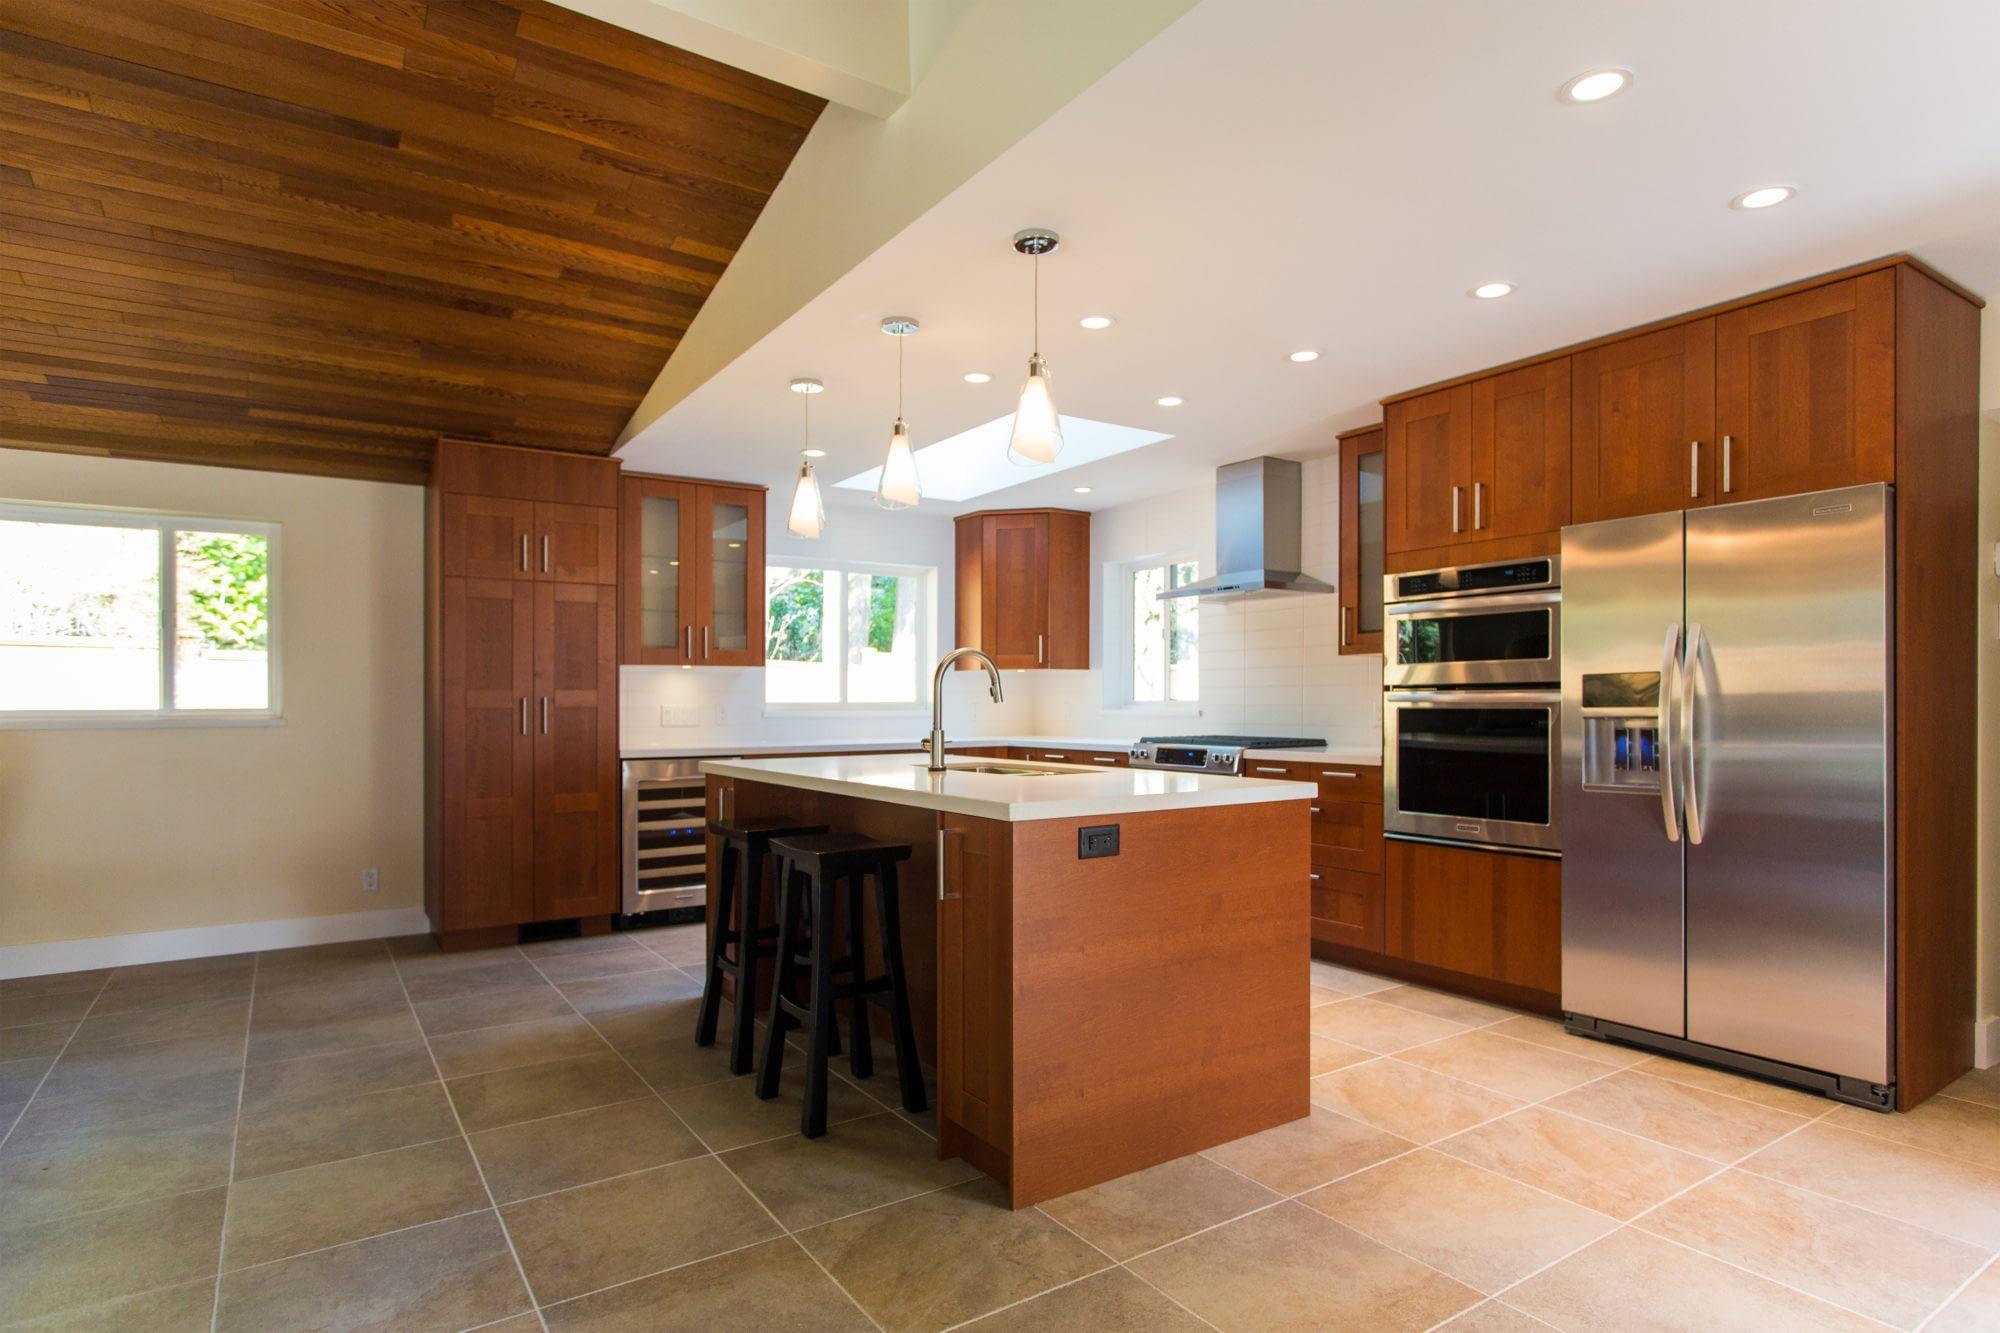 Kitchen Renovation Project Full Rebuild